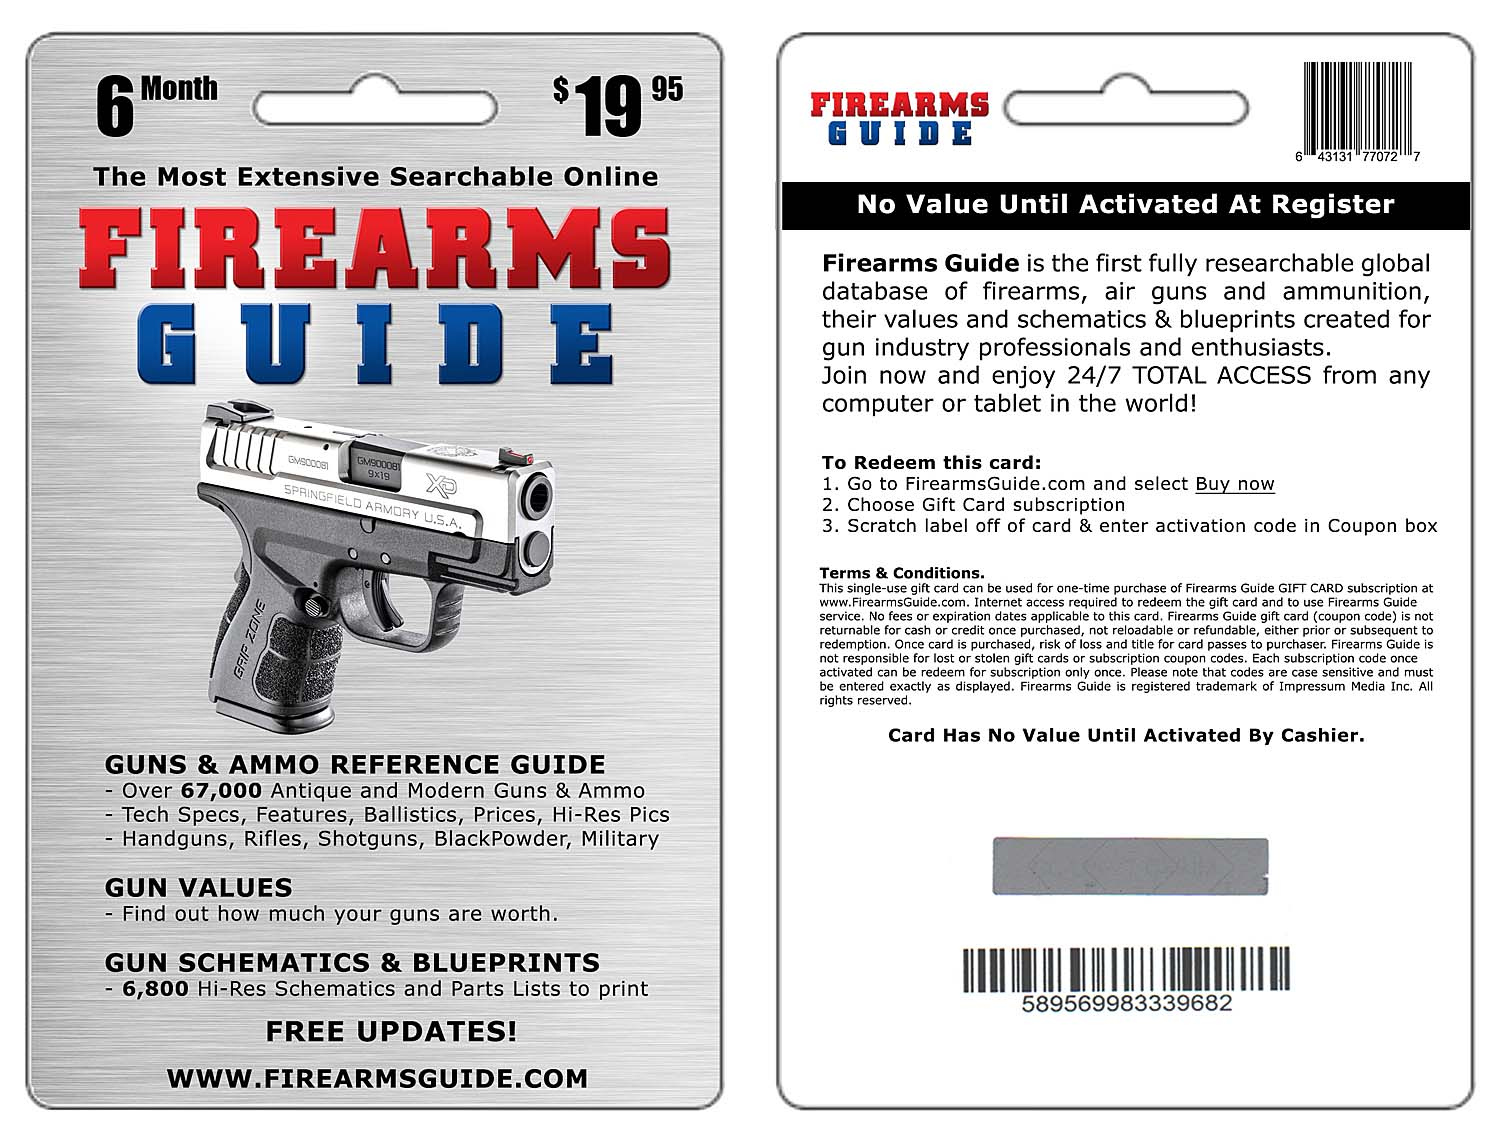 Firearms Guide: the 8th edition is on Flash Drive ... on handgun illustrations, handgun drawings, handgun prototypes, handgun components, handgun power, handgun accessories, handgun dimensions, handgun blueprints, handgun safety, handgun concepts, handgun information, handgun diagrams, handgun parts,